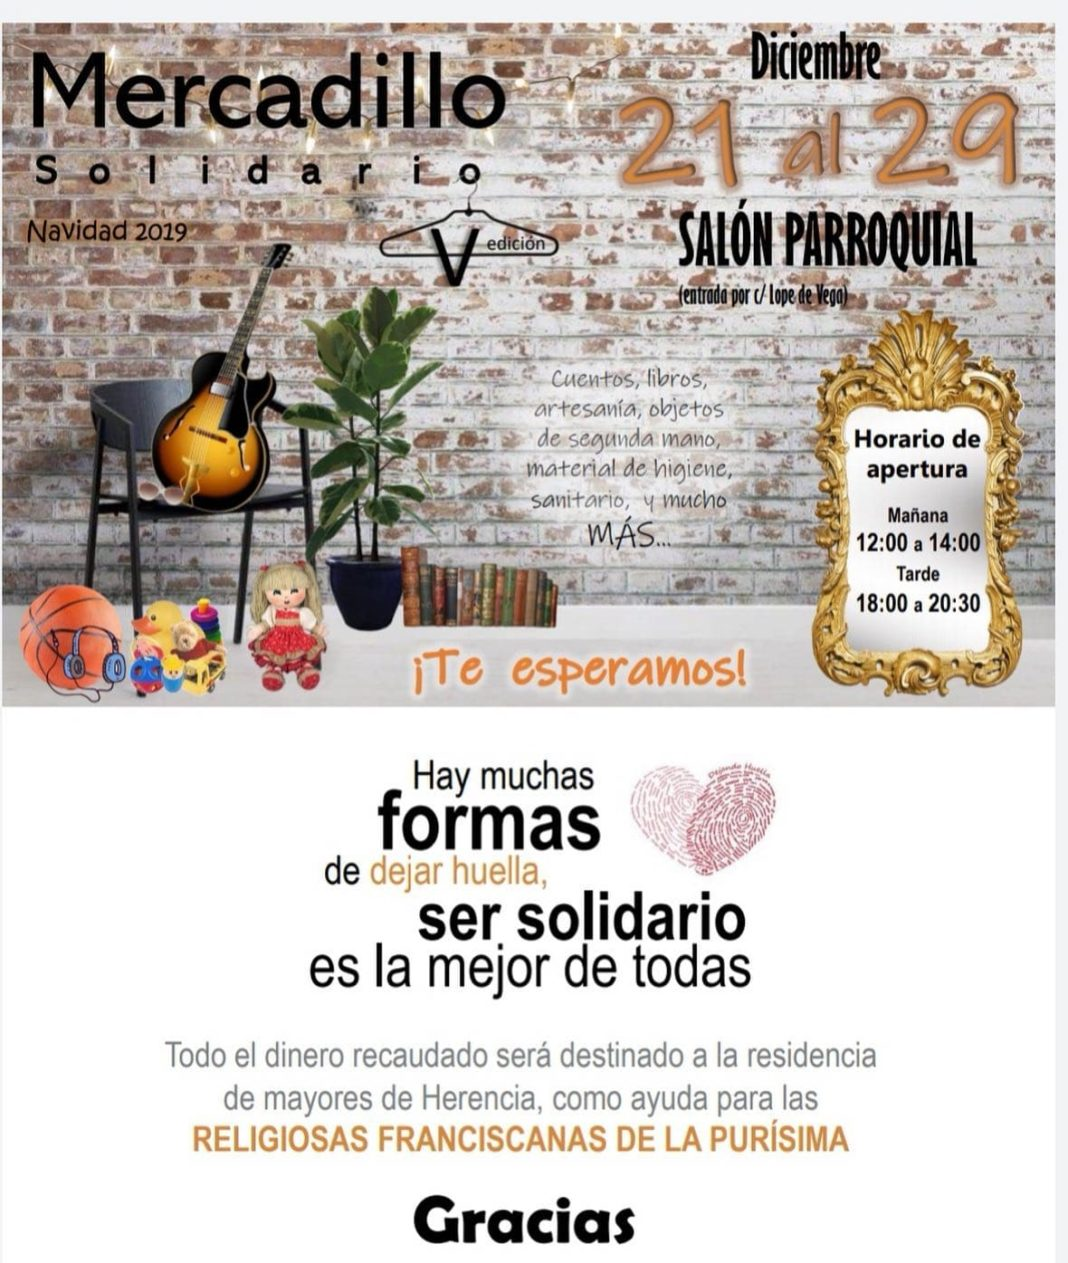 Mercadillo Solidario en Herencia esta navidades 4